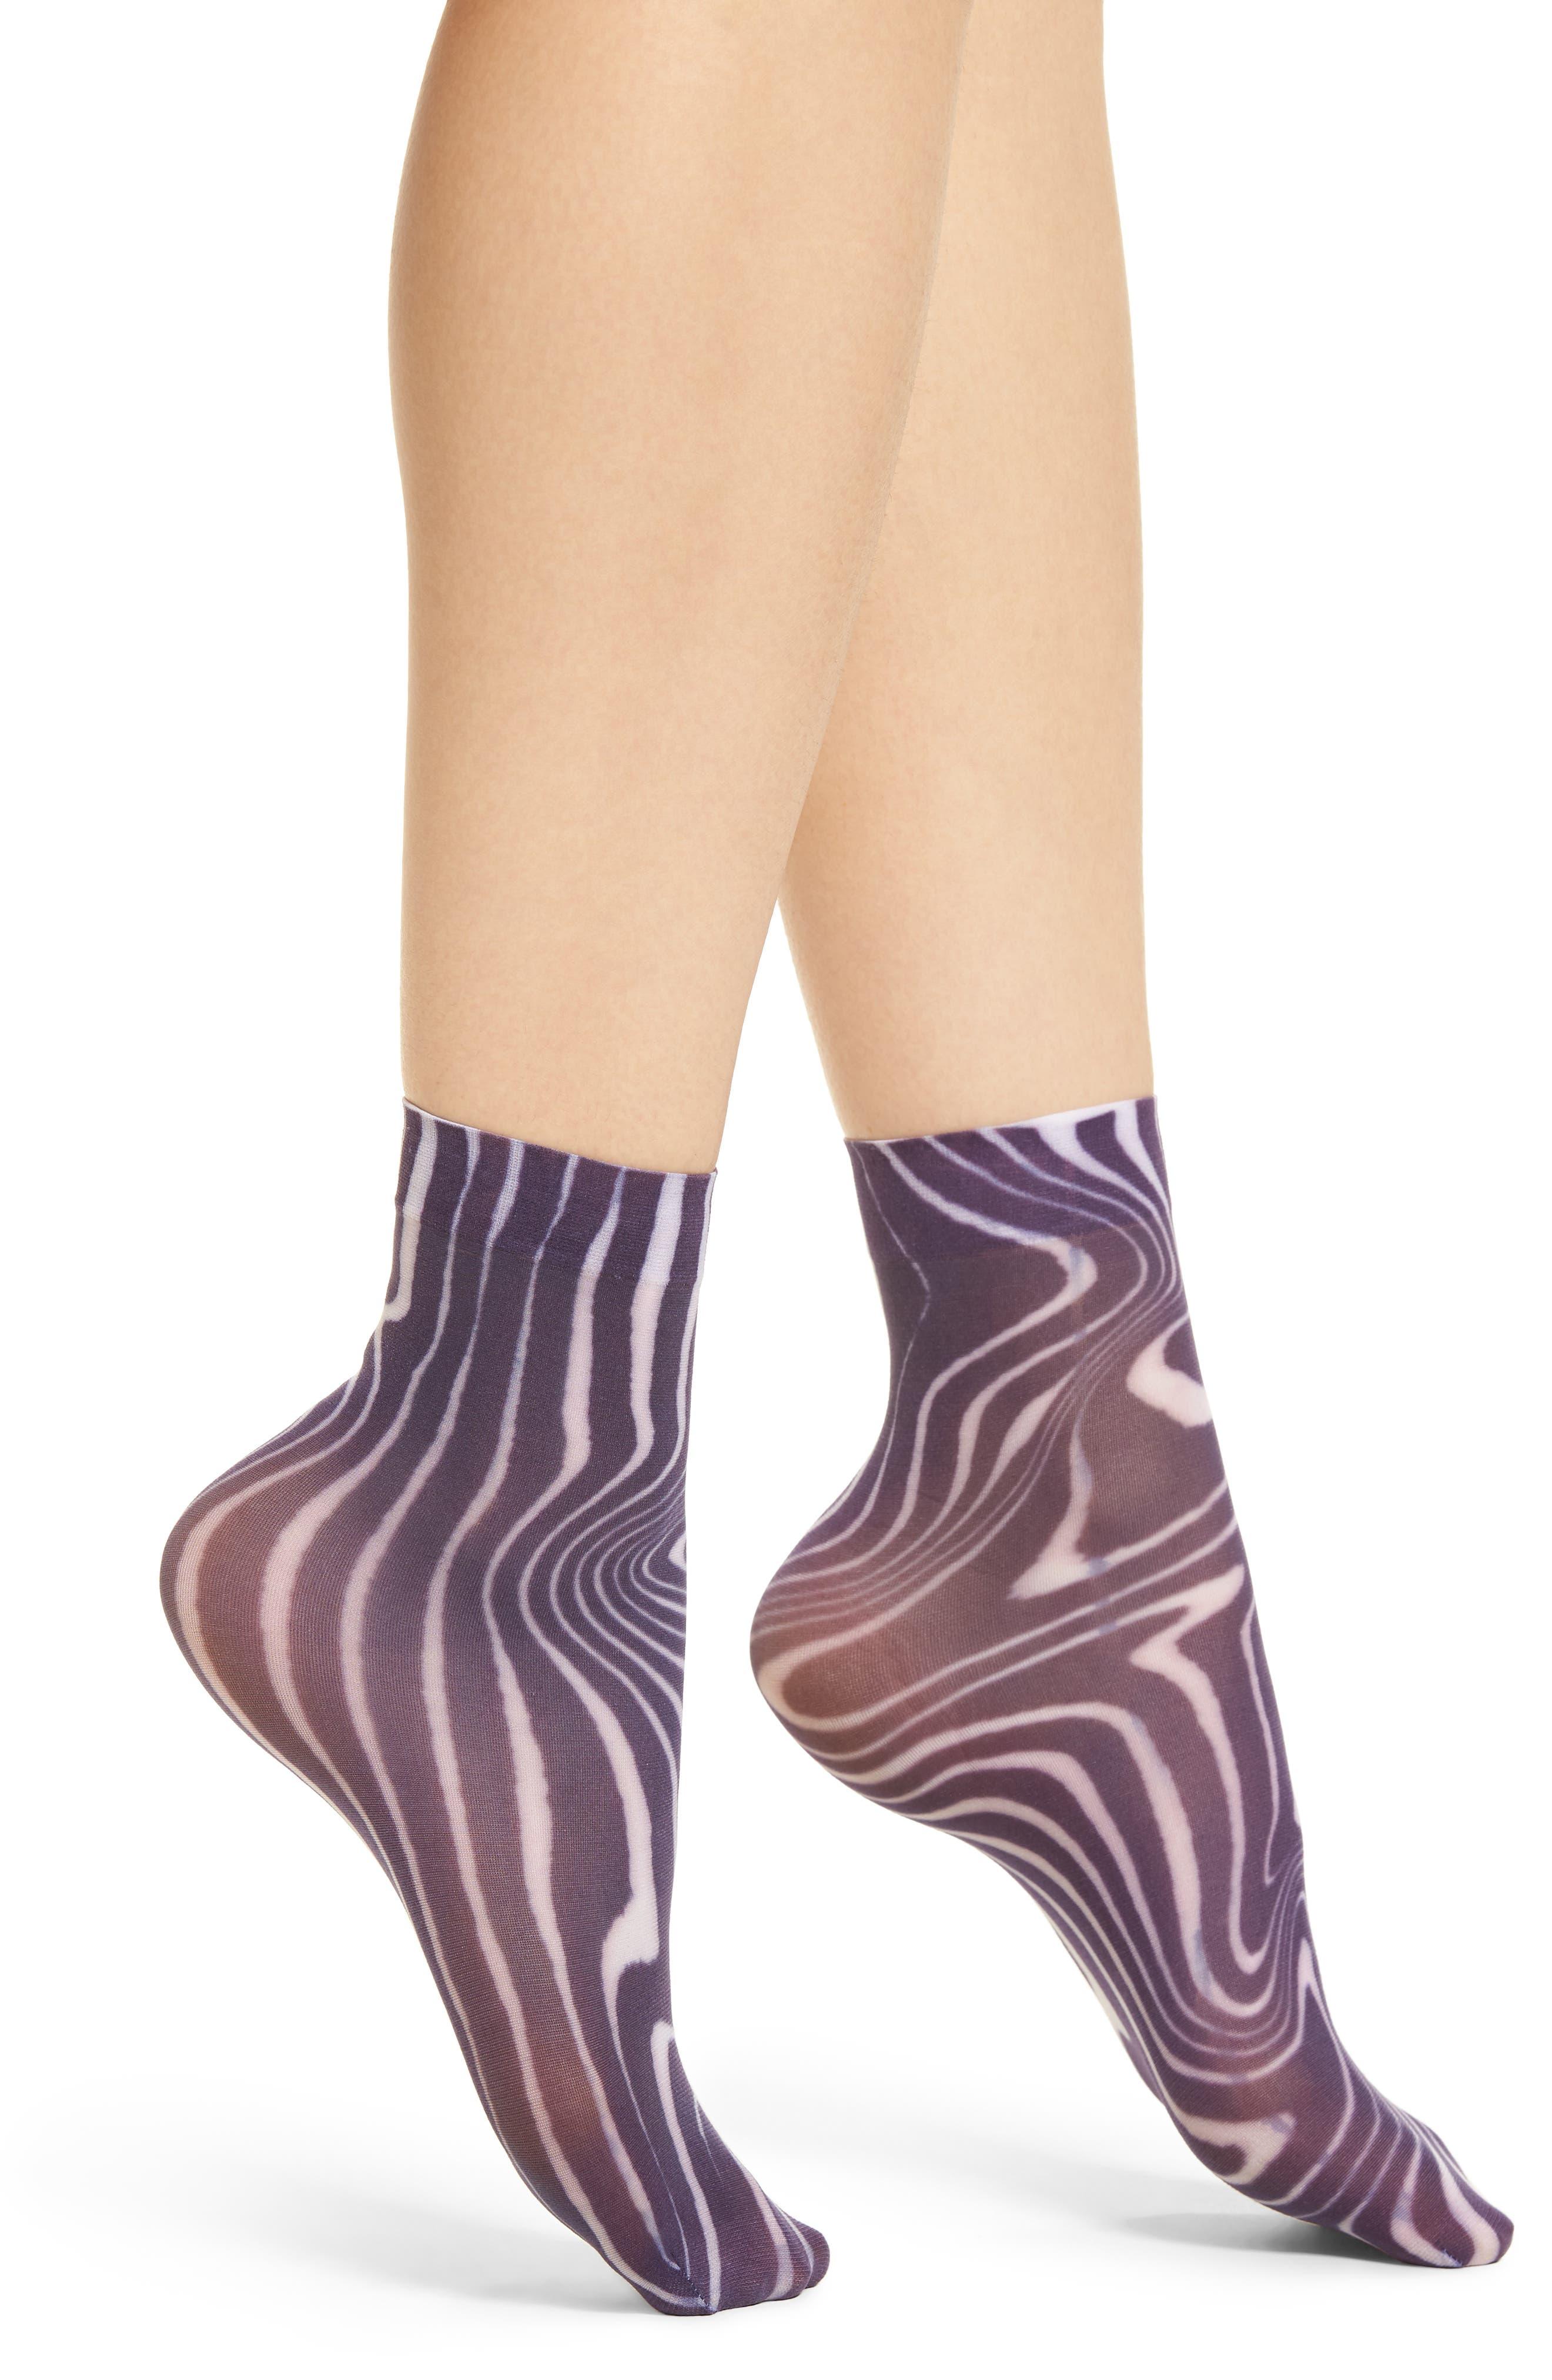 Hysteria Mia Ankle Socks,                             Main thumbnail 1, color,                             Black